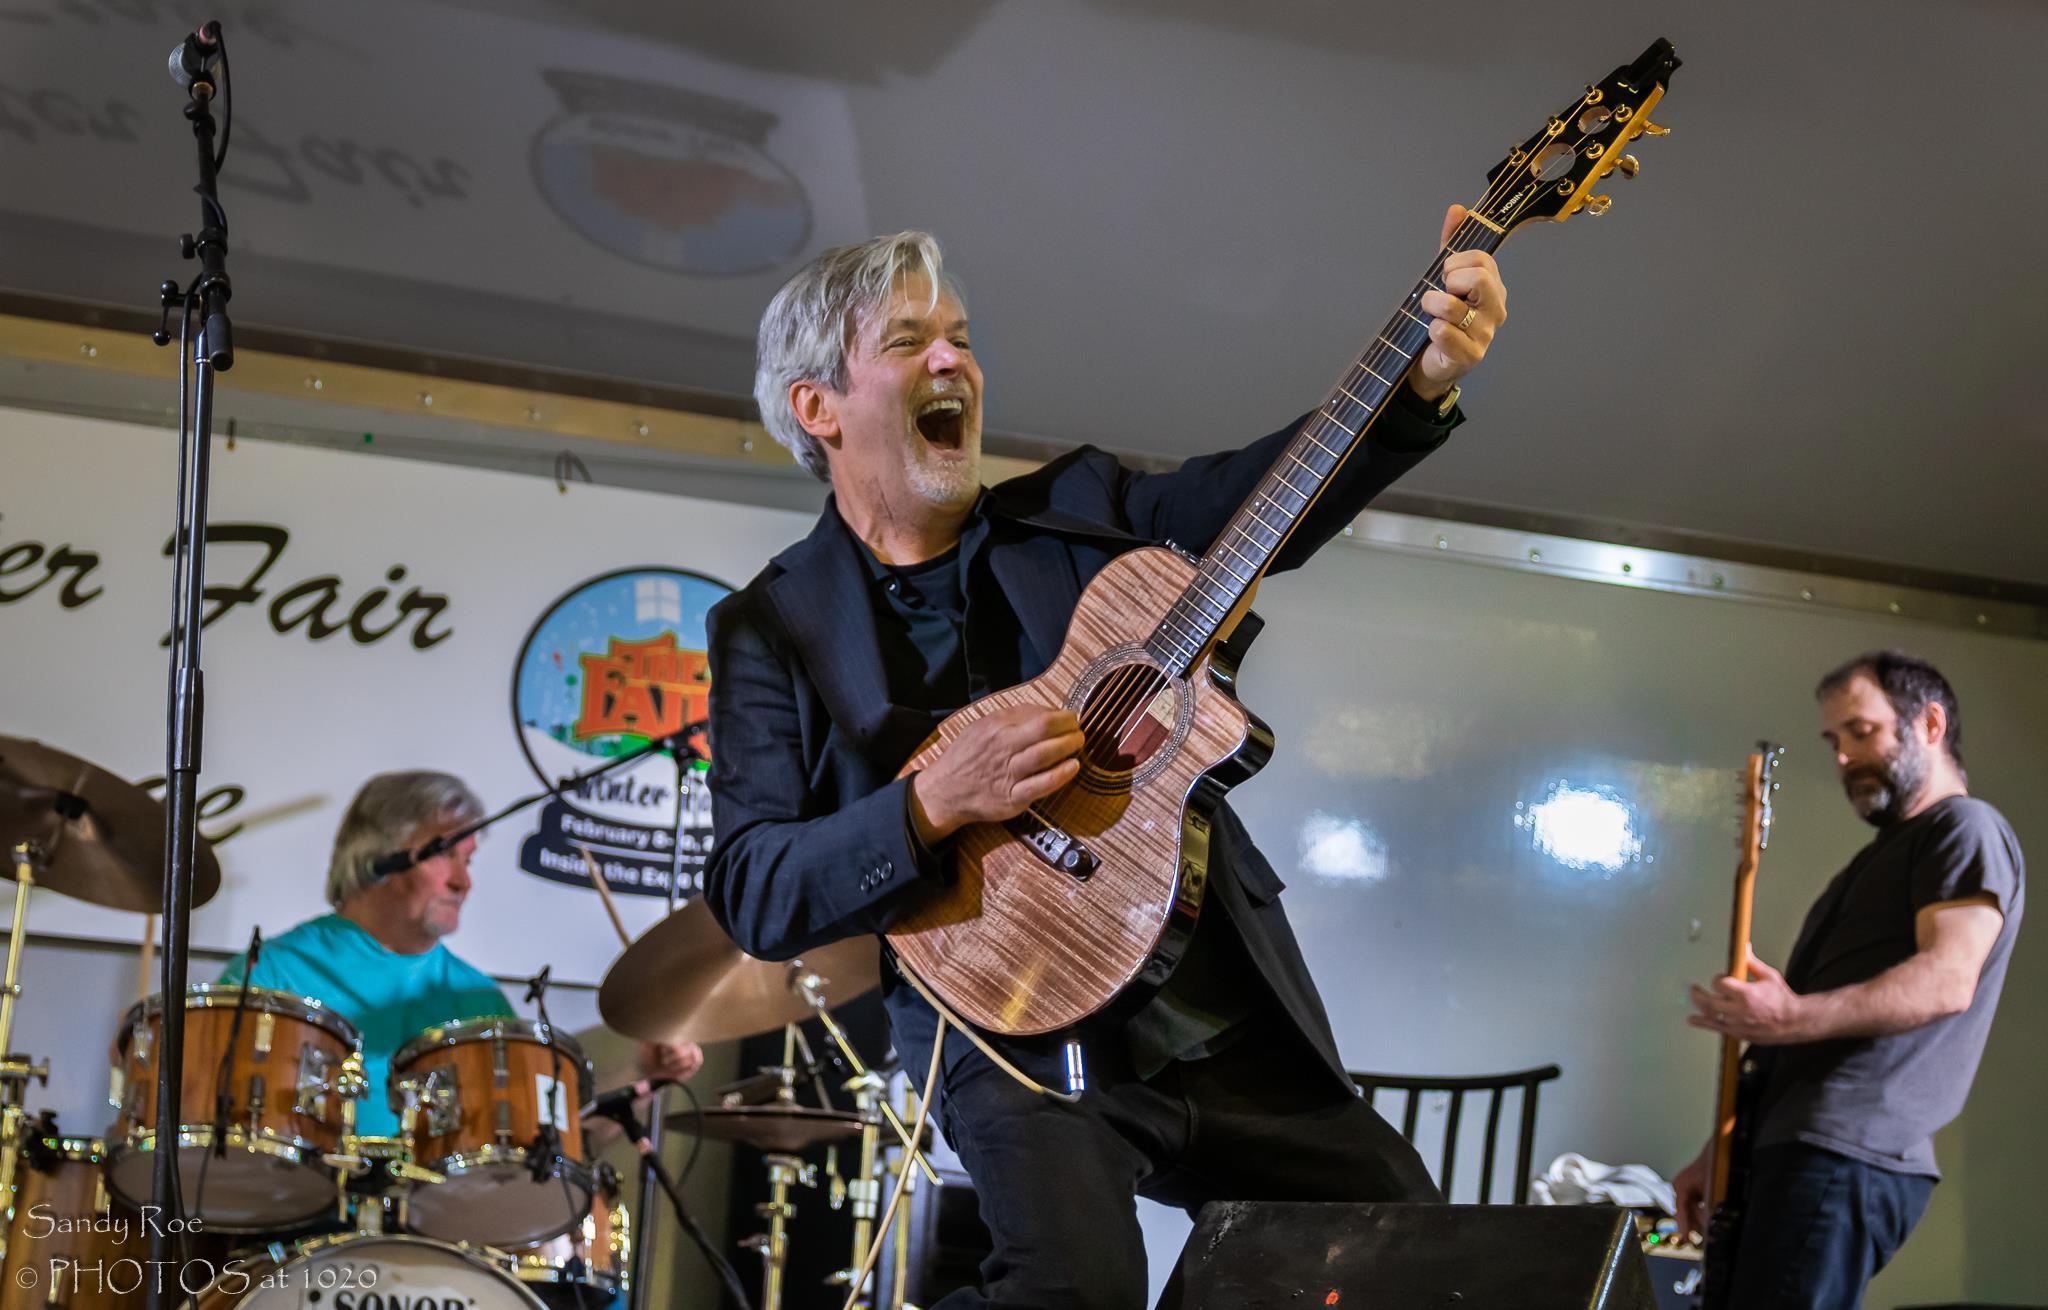 The Todd Hobin Band Rocks Winter Fair   Photo by Sandy Roe, Photos at 1020